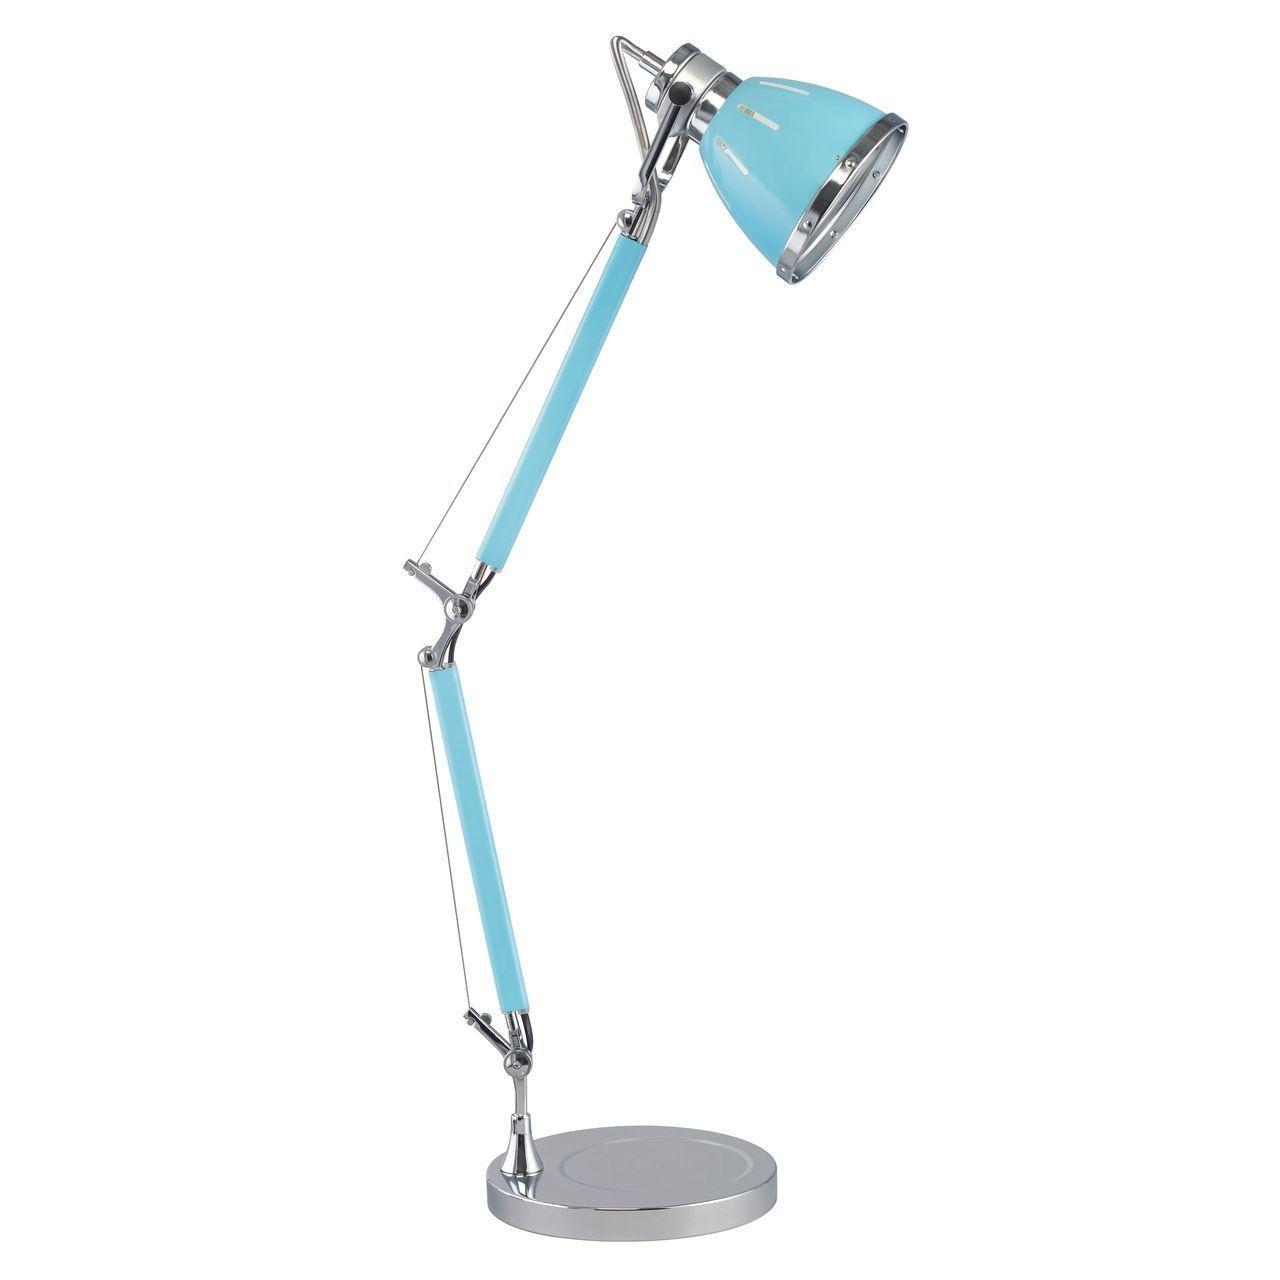 Настольная лампа Spot Light Jerona 7050108 настольная лампа spot light jerona 7050108